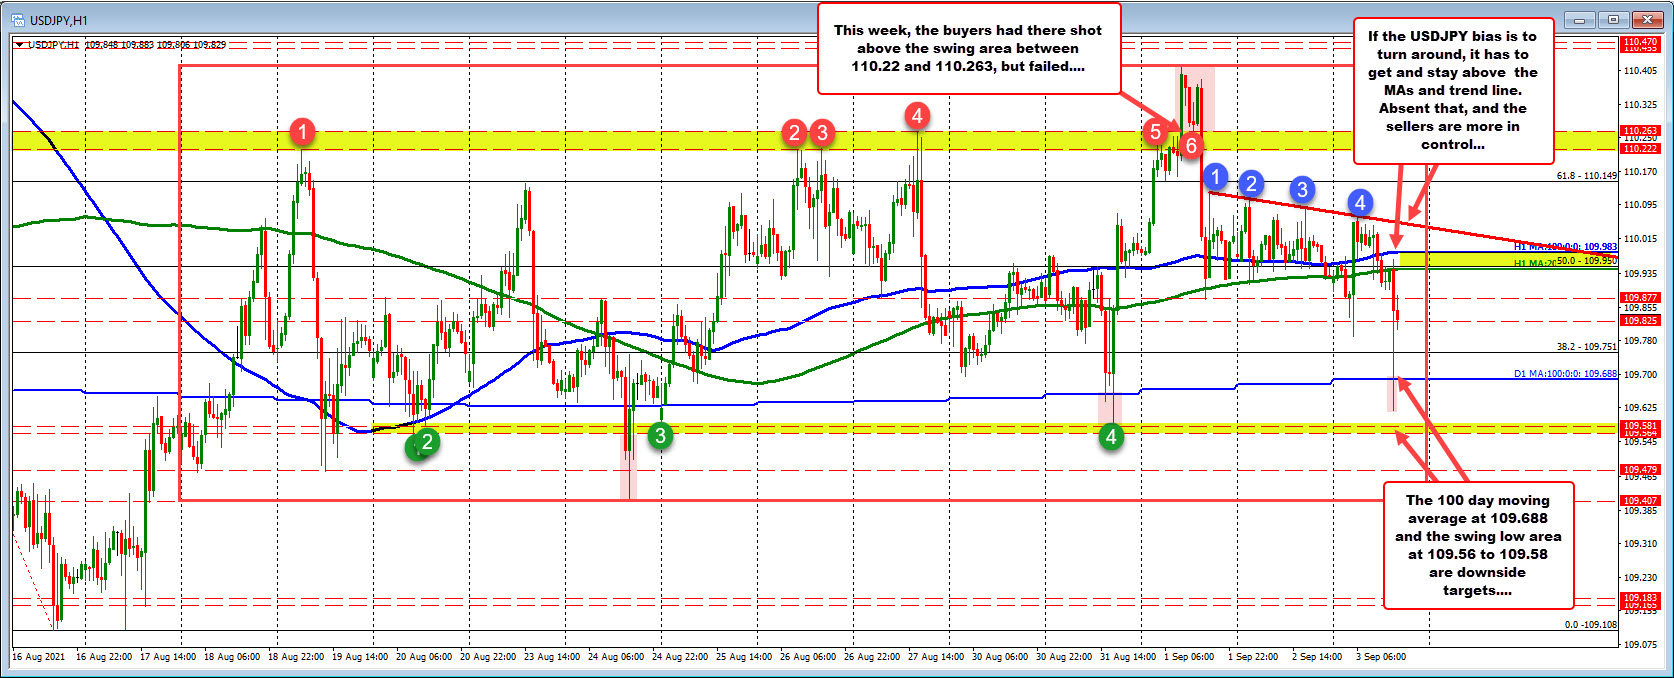 USDJPY stays on the dollar bearish side of the technical ledger